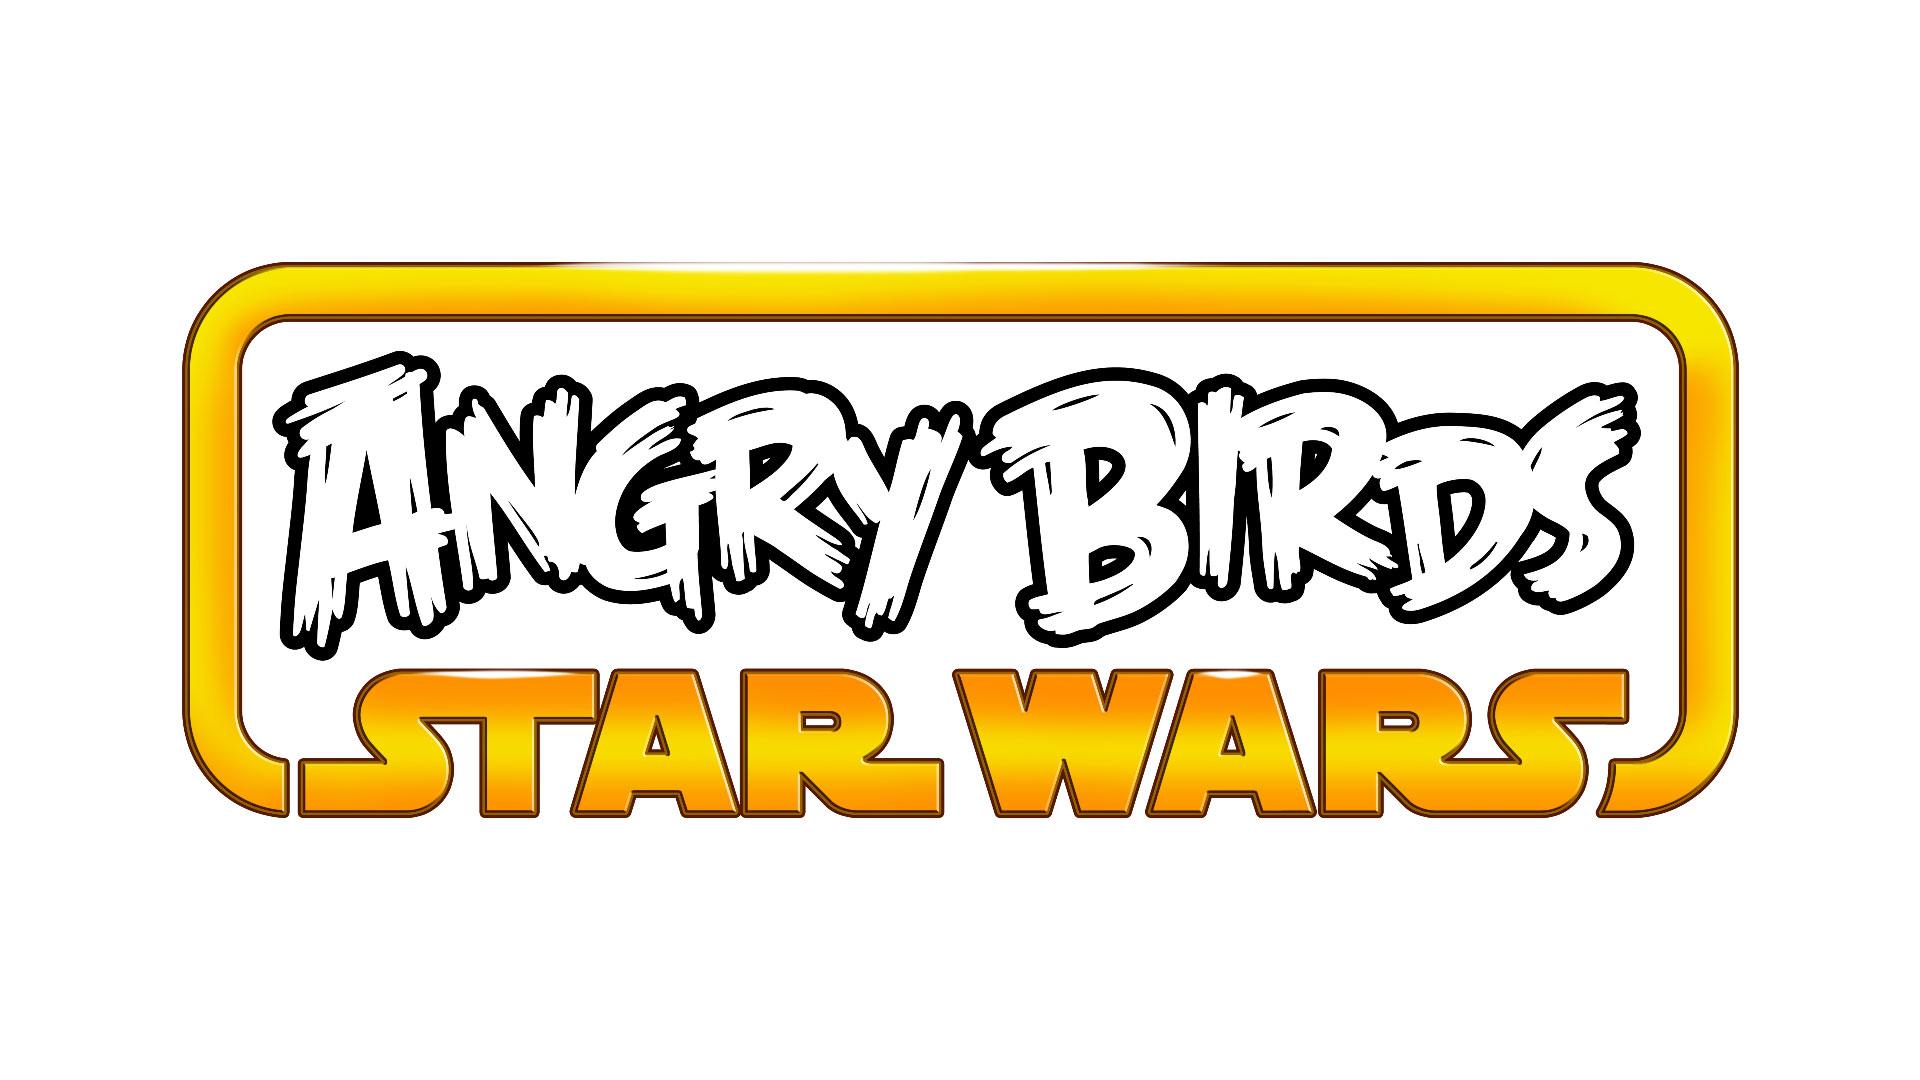 Angry-Birds-Star-Wars-Logo-1920x1080-wallpaper-wp3602489